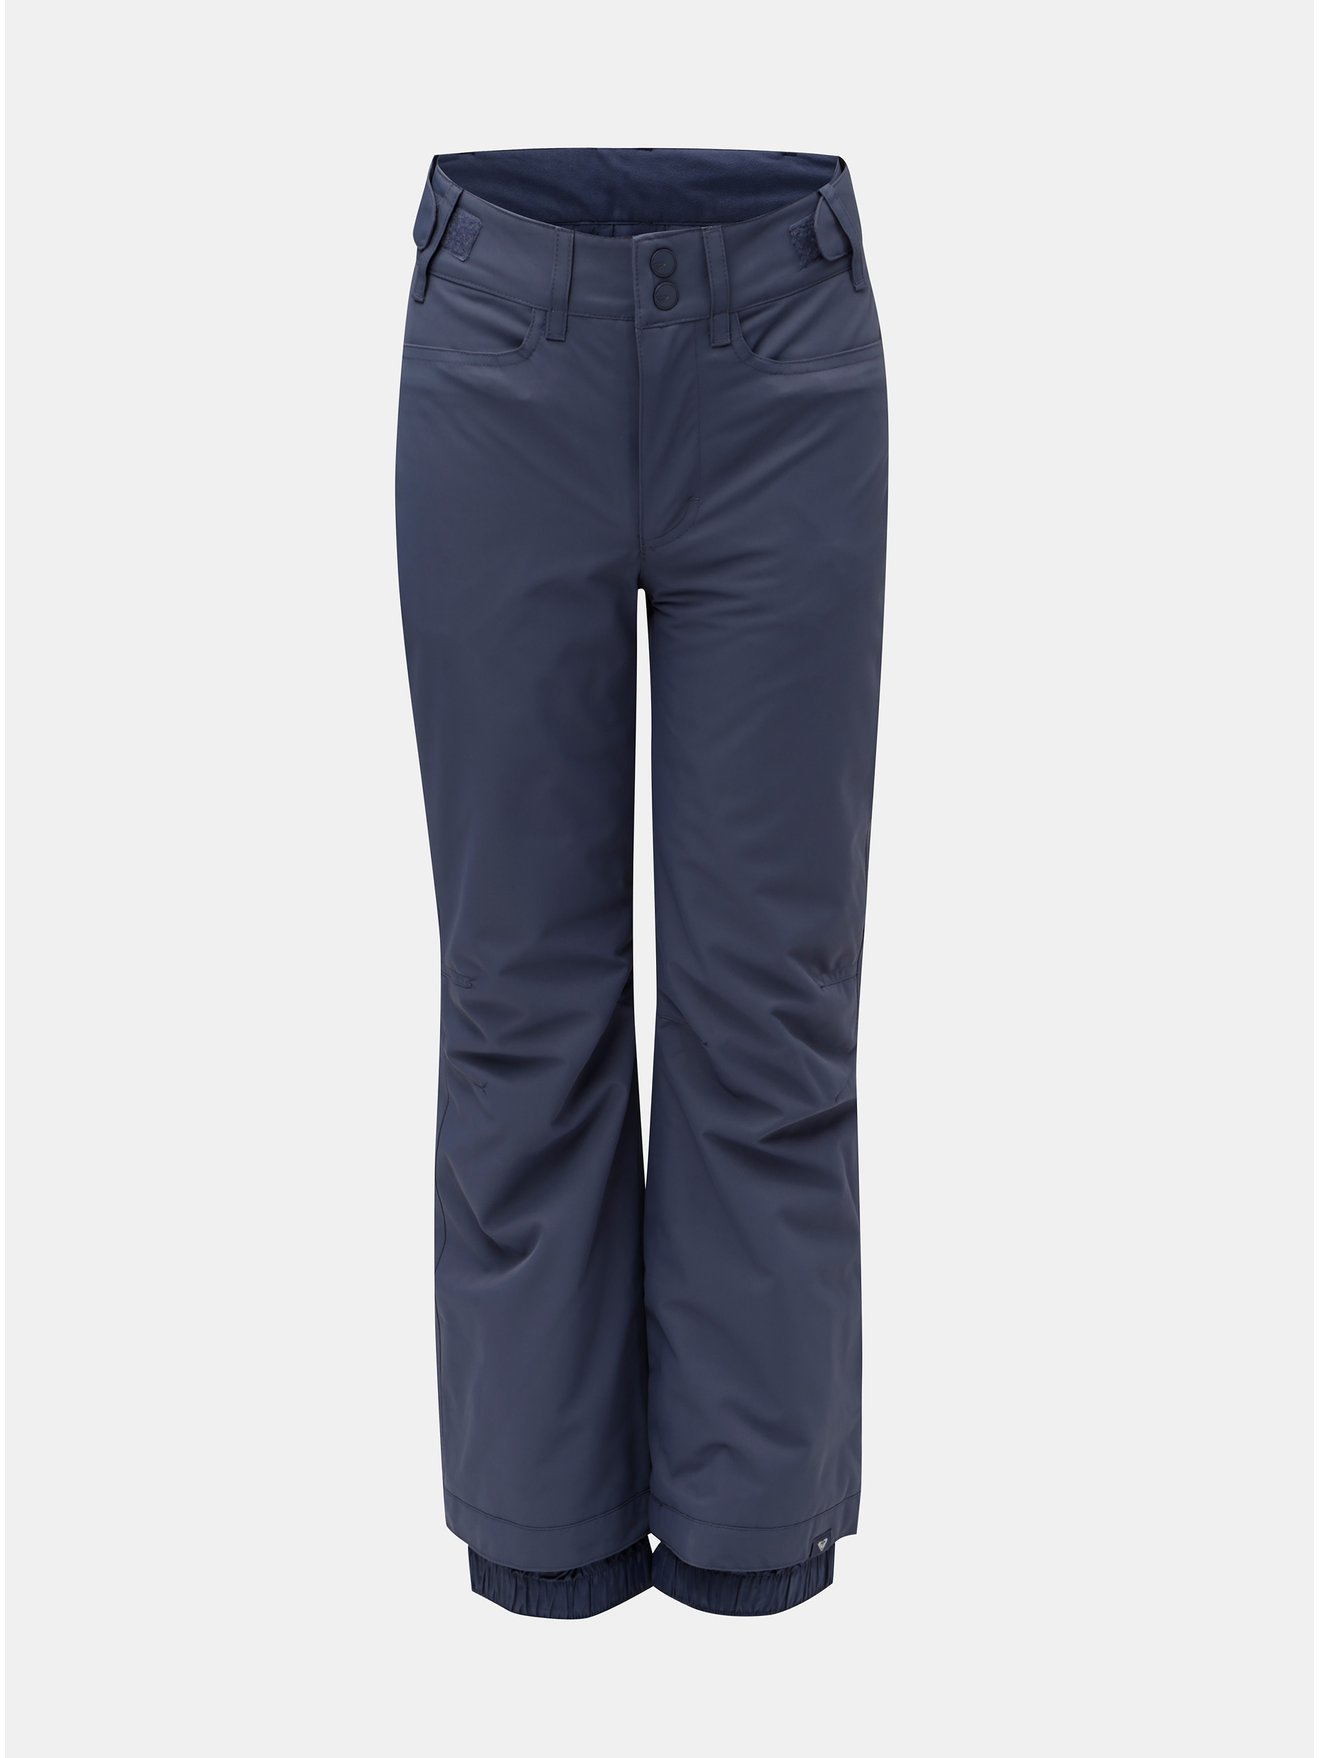 8412d4dd1 Modré dievčenské nepremokavé otepľovačky Roxy Backyard | Moda.sk